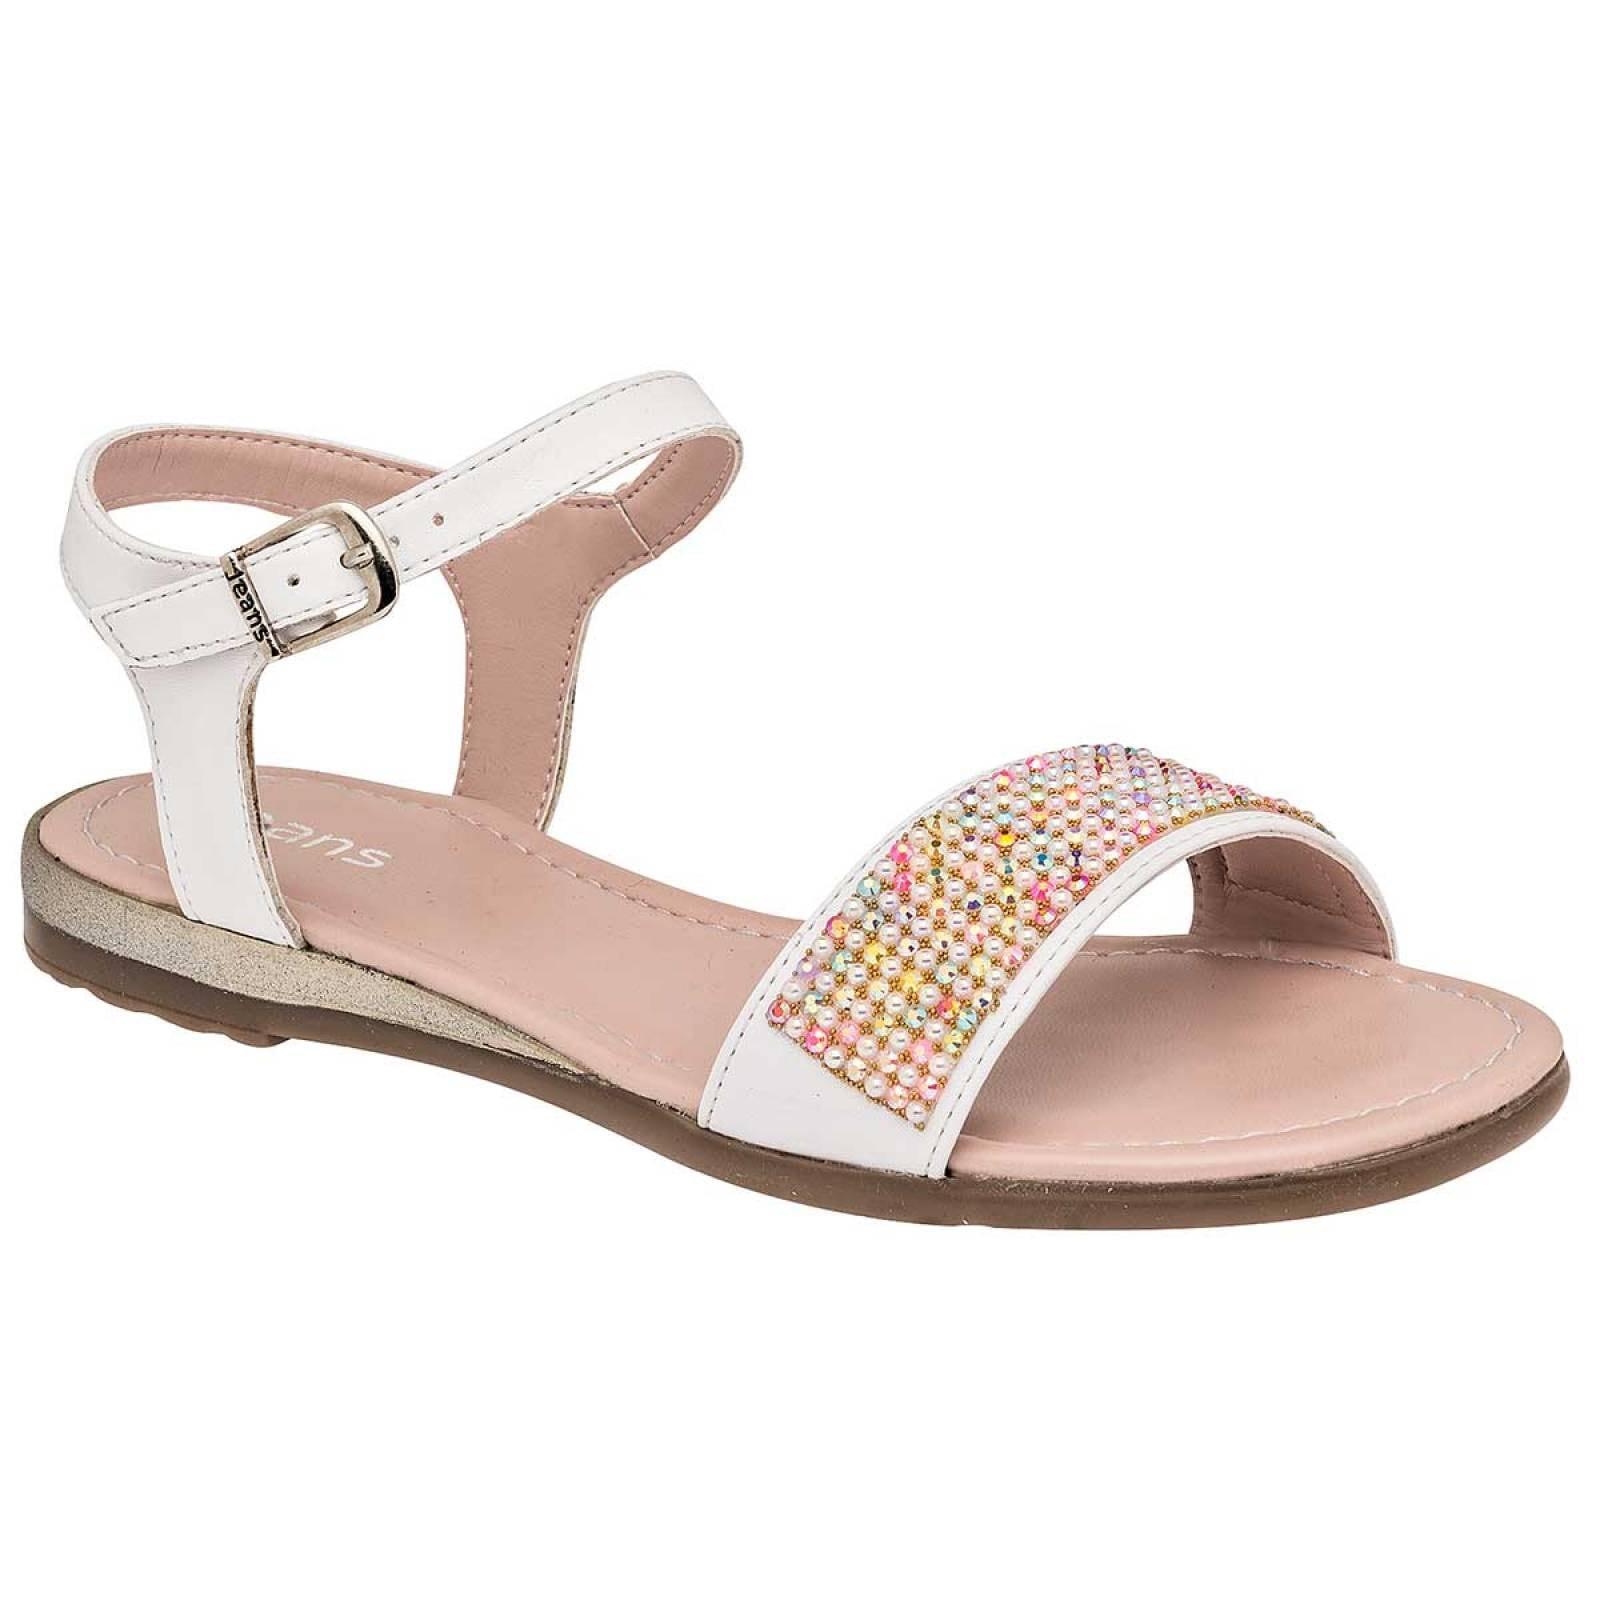 Jeans shoes Sandalia Mujer Blanco multicolor